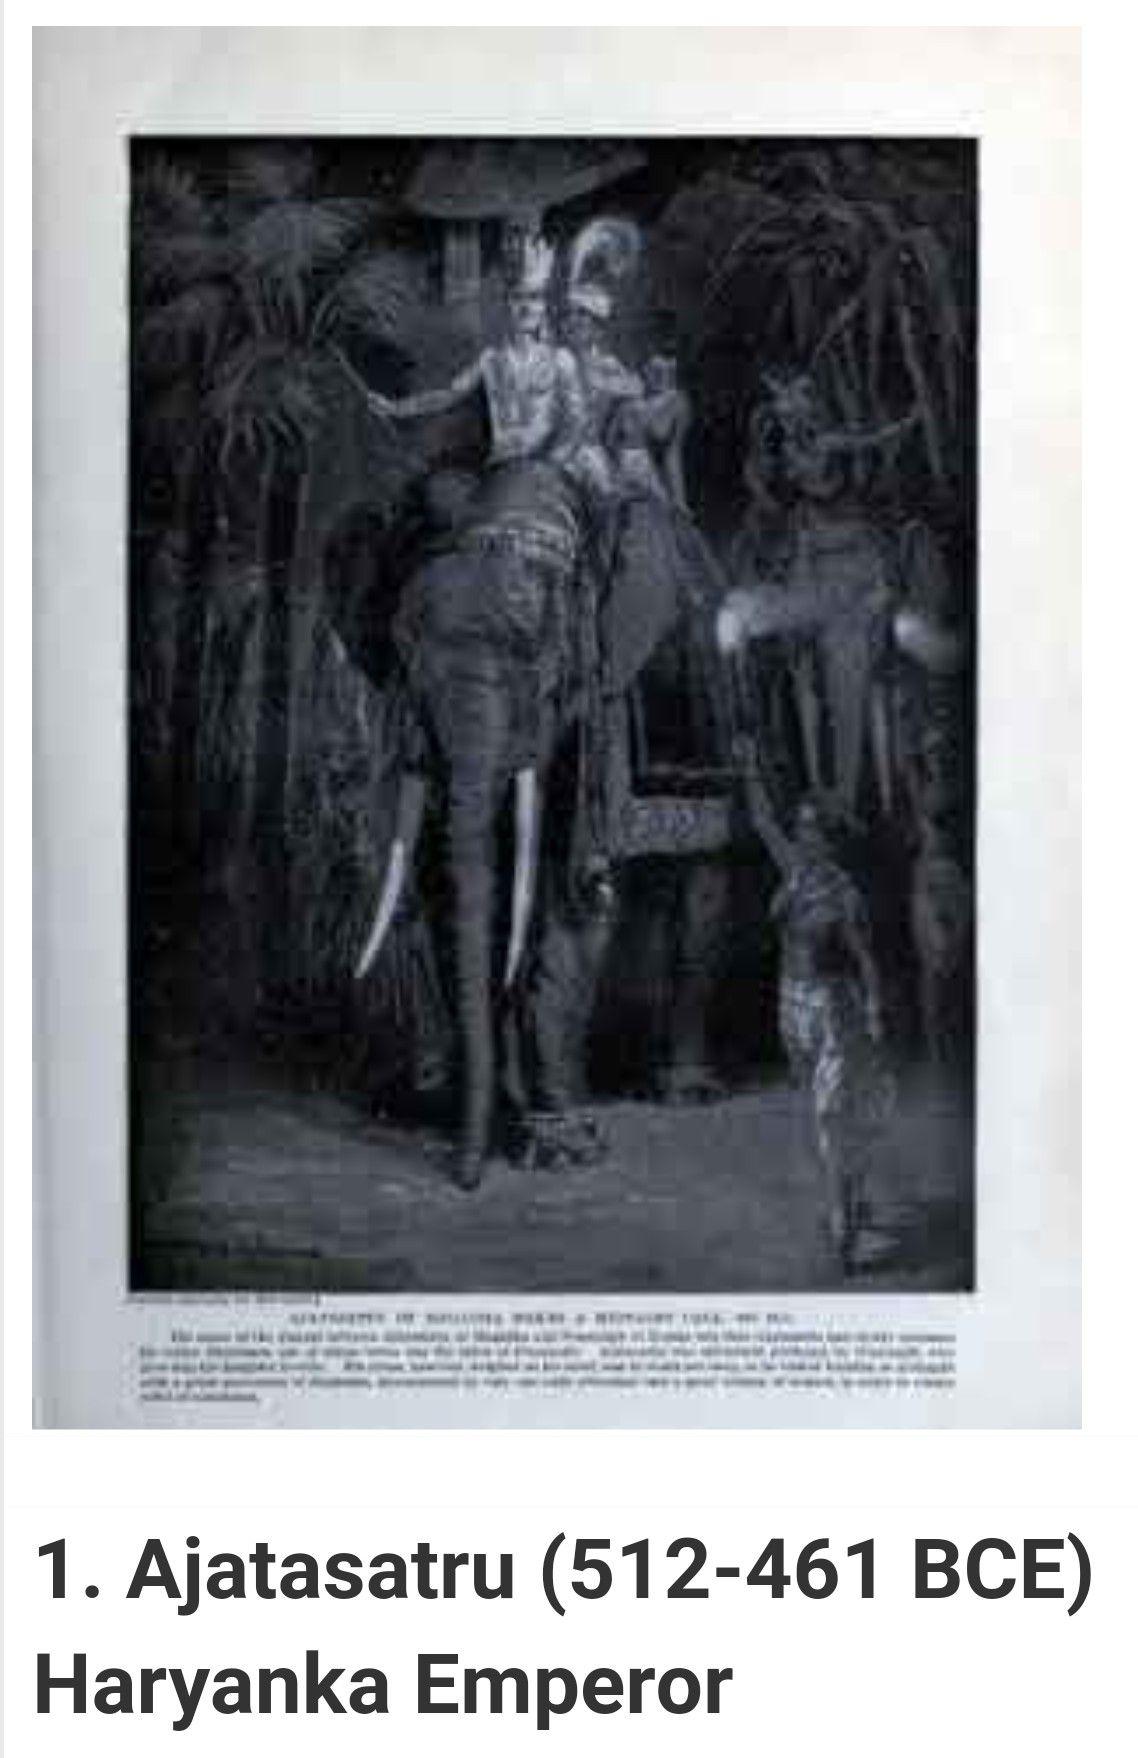 Pin P 684 Bce 413 Bce Haryanka Empire Of Magadh